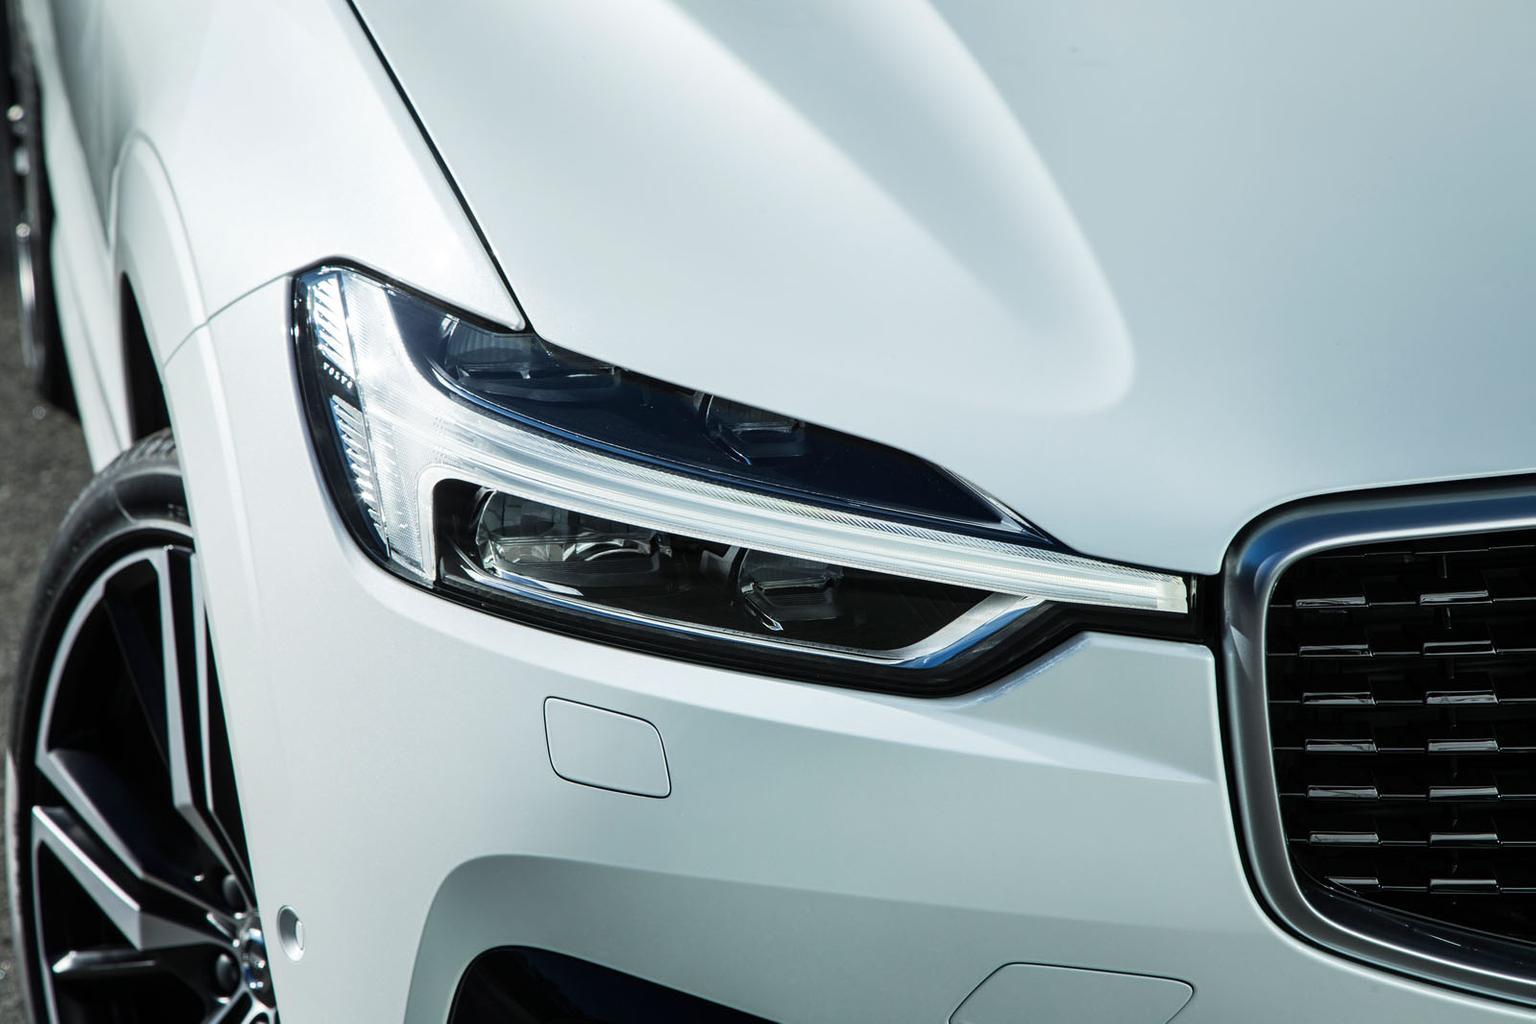 2017 Volvo XC60 gallery